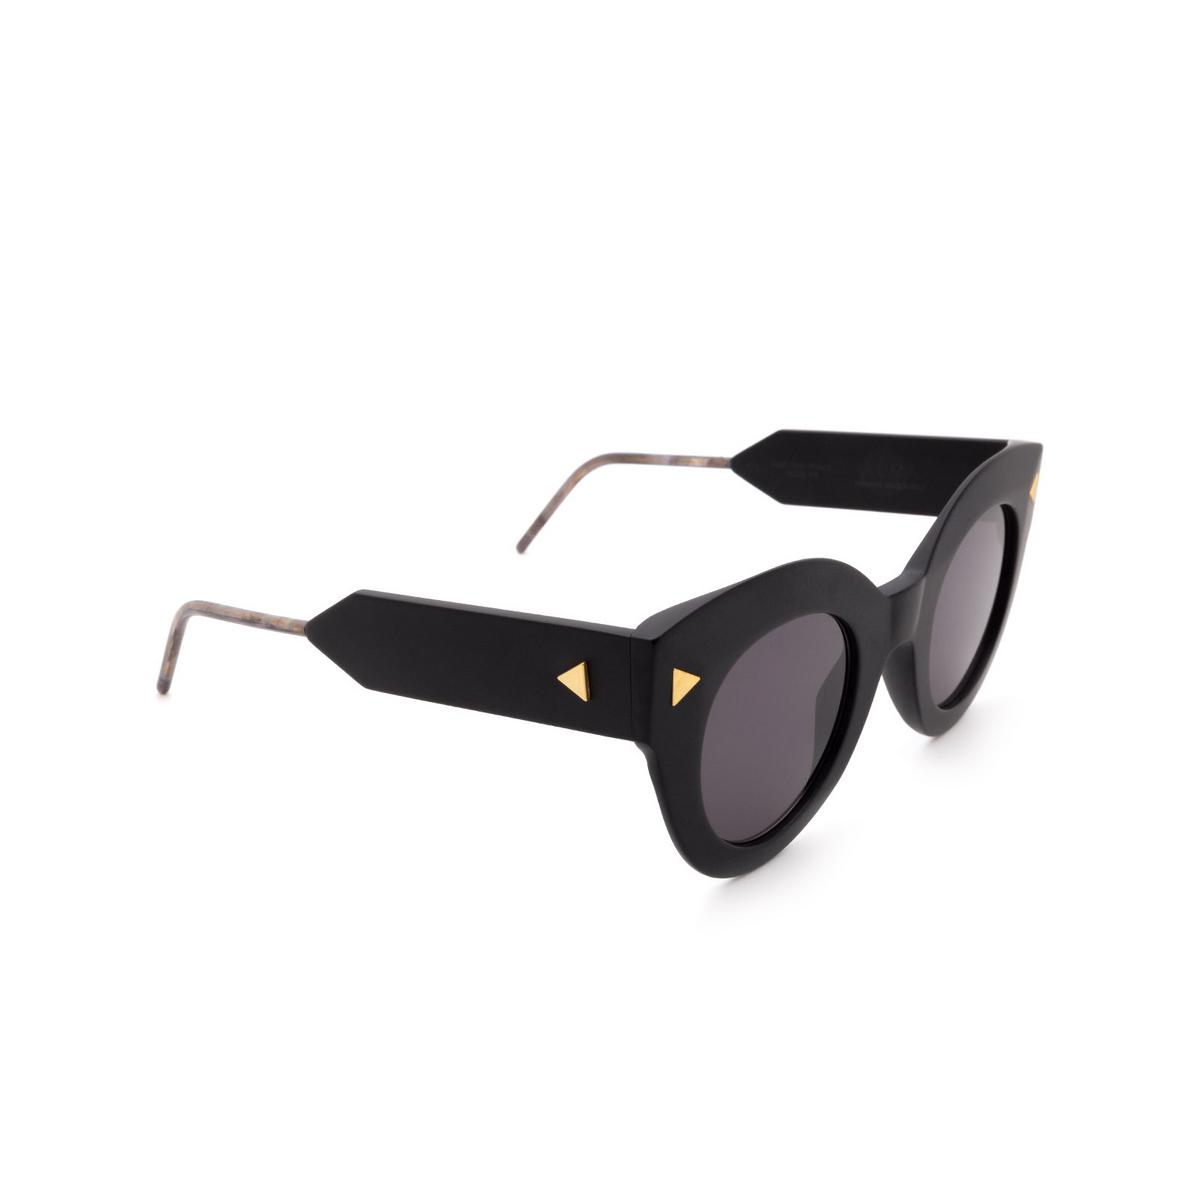 Soya® Cat-eye Sunglasses: Alma color Matte Black Bkm-fs - three-quarters view.